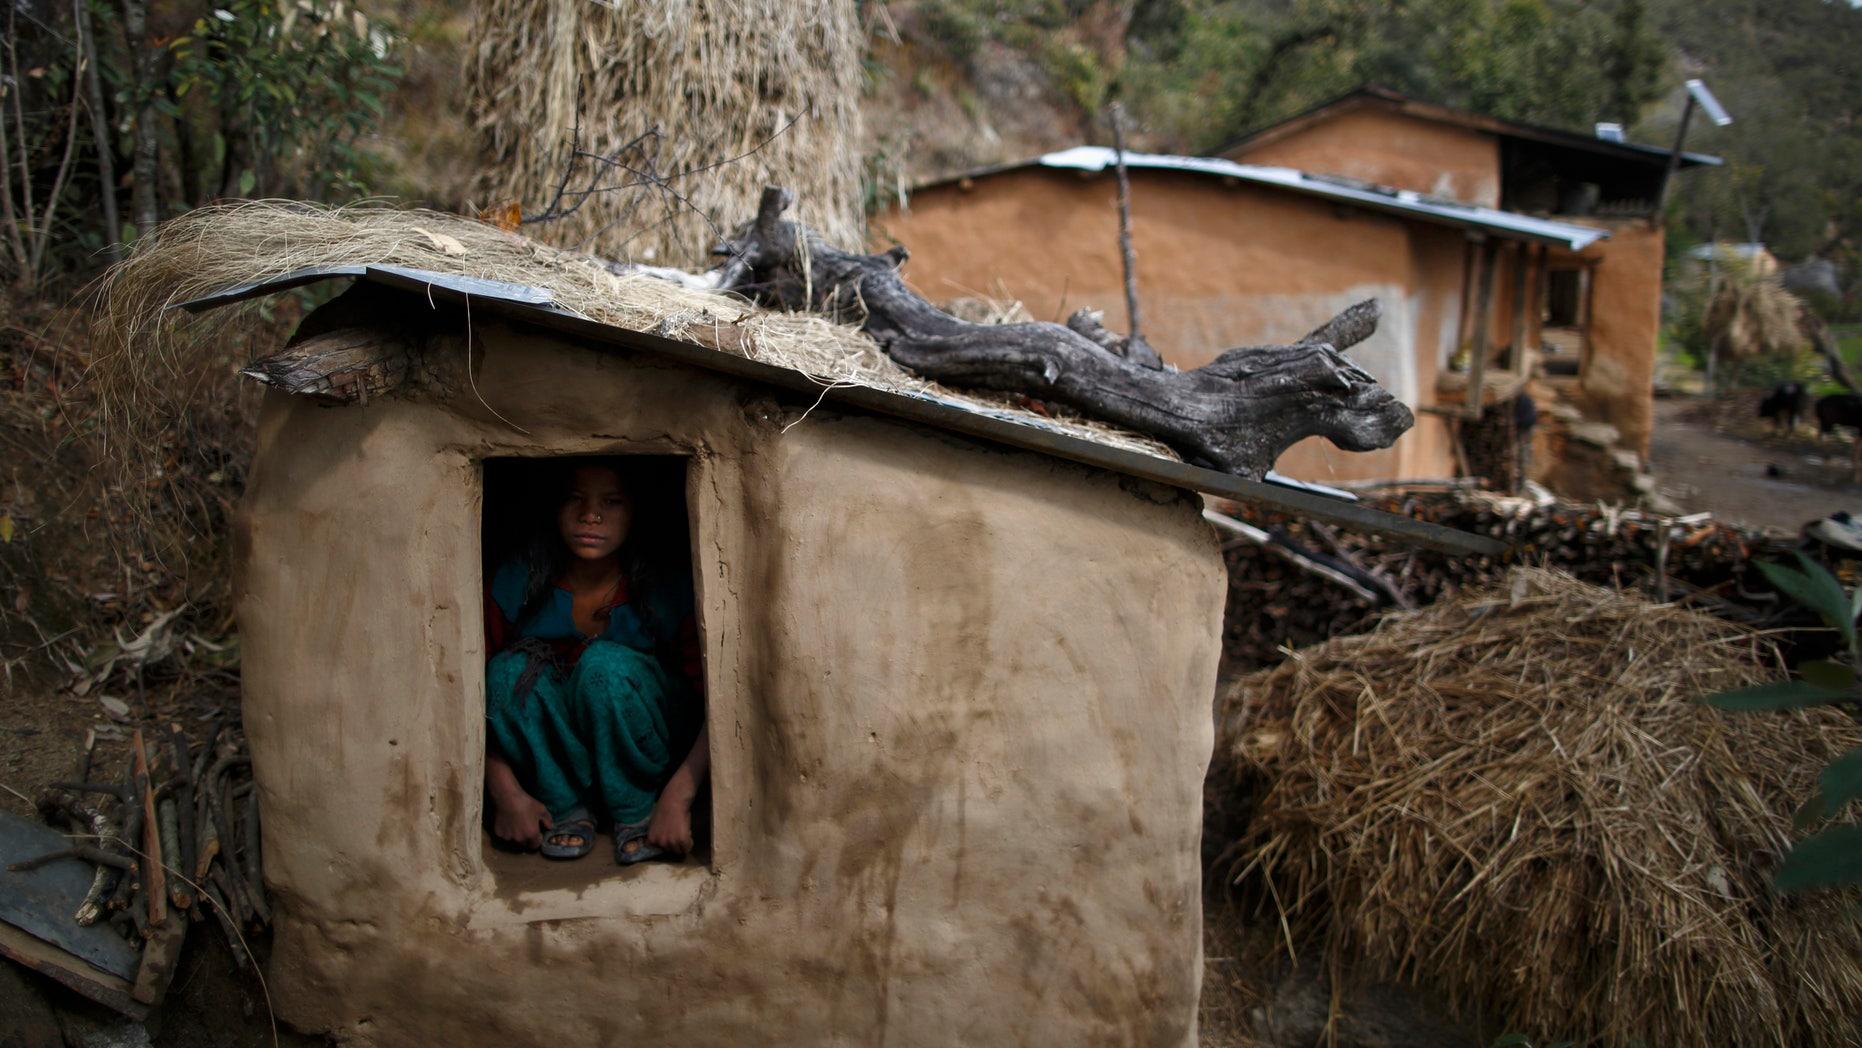 Uttara Saud, 14, sits inside a Chaupadi shed in the hills of Legudsen village in Achham District in western Nepal February 16, 2014